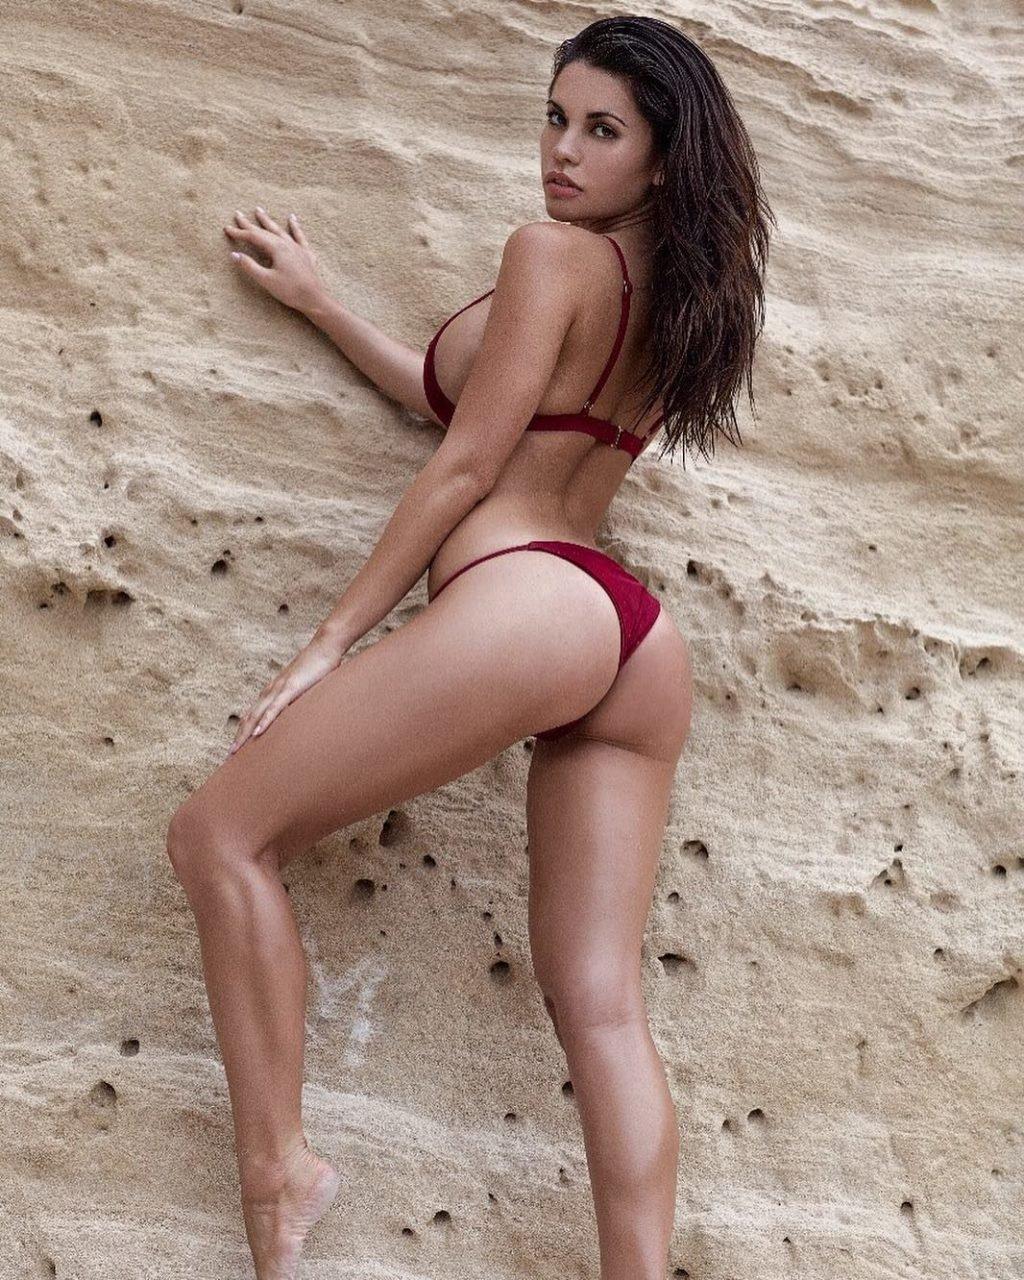 Genesis mia lopez hot,Mila Kunis Naked Ass Upskirt Audition Video Erotic photos Antonia toni garrn 2019,Lady gaga sexy photos 2